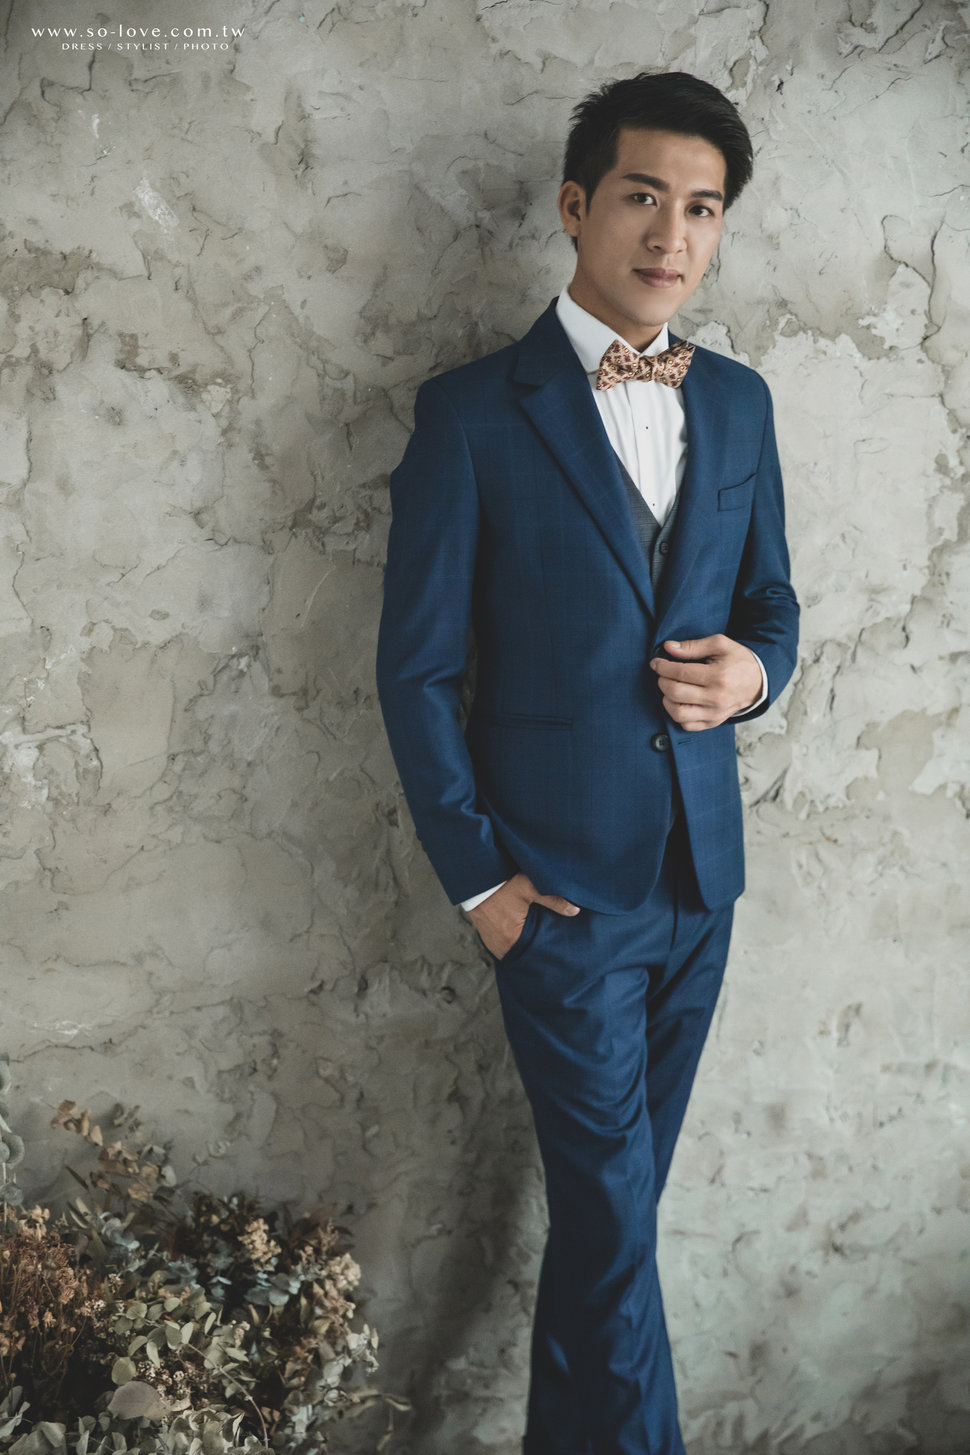 RYAN8269 - So.Love Wedding 樂樂蕾絲《結婚吧》